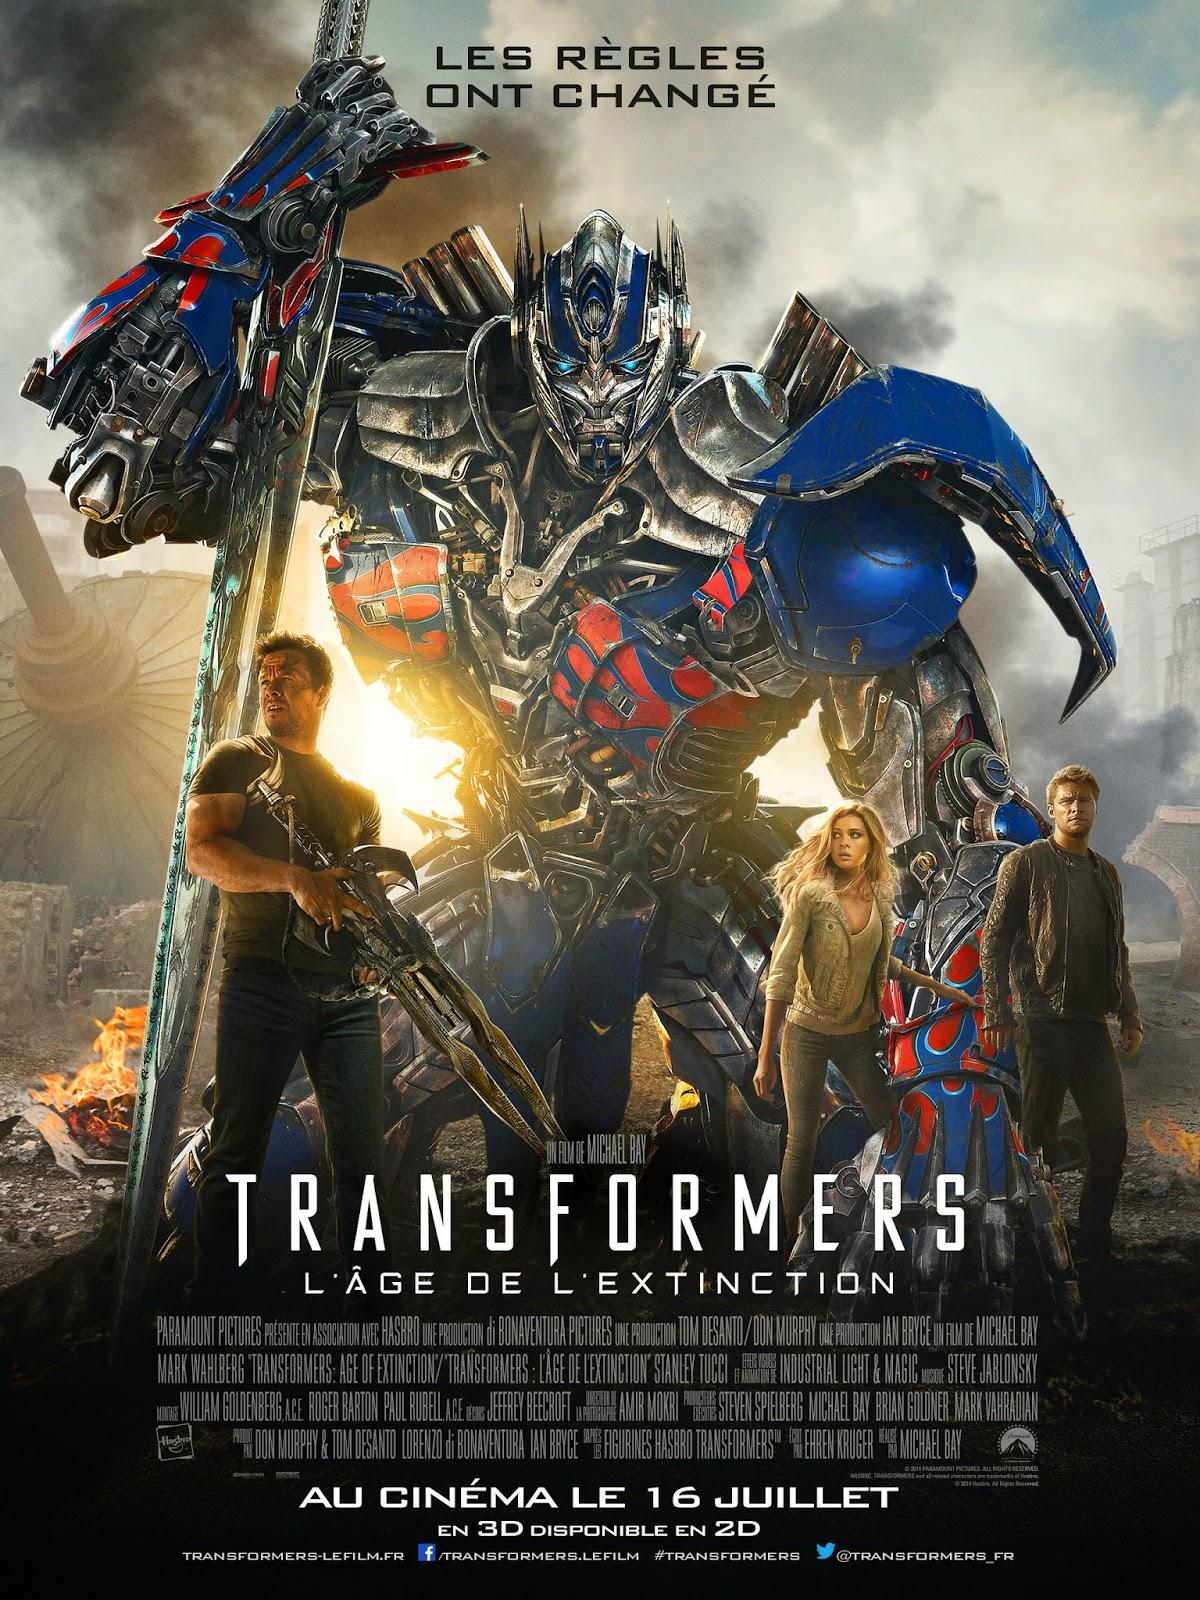 http://lecturesetcie.blogspot.com/2014/07/cinema-transformers-4-lage-de.html